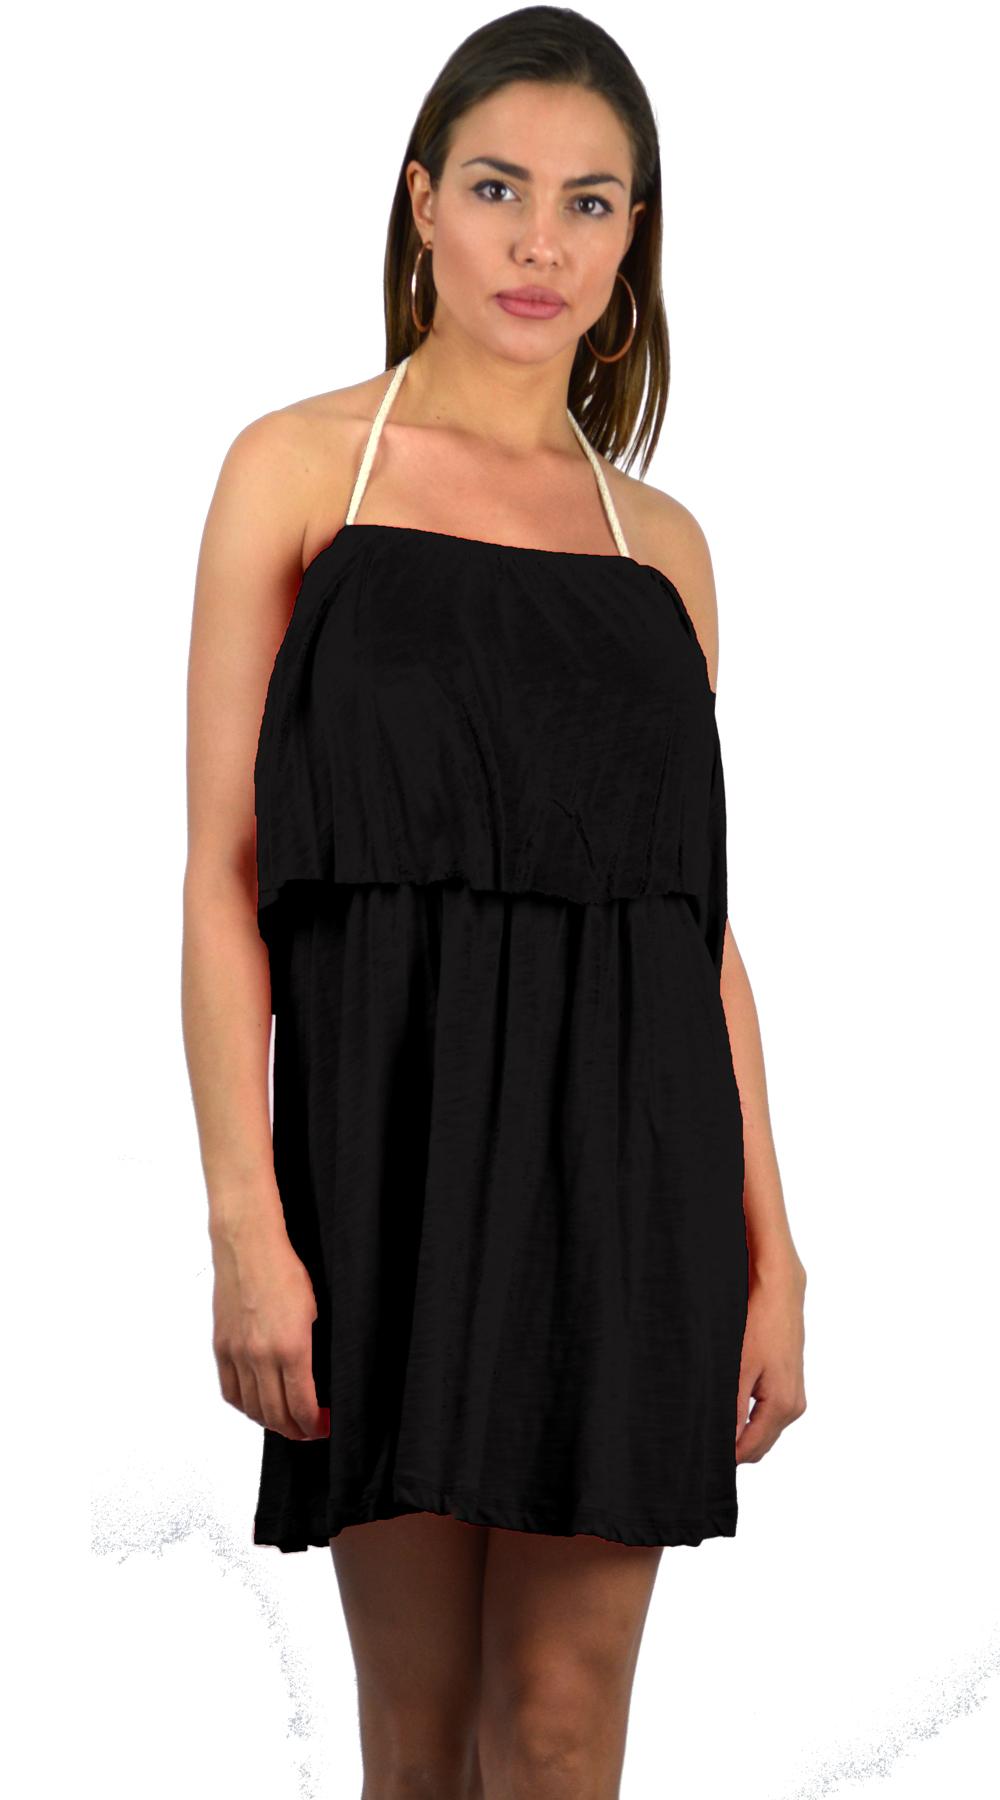 casual strapless dress swim missreinacom